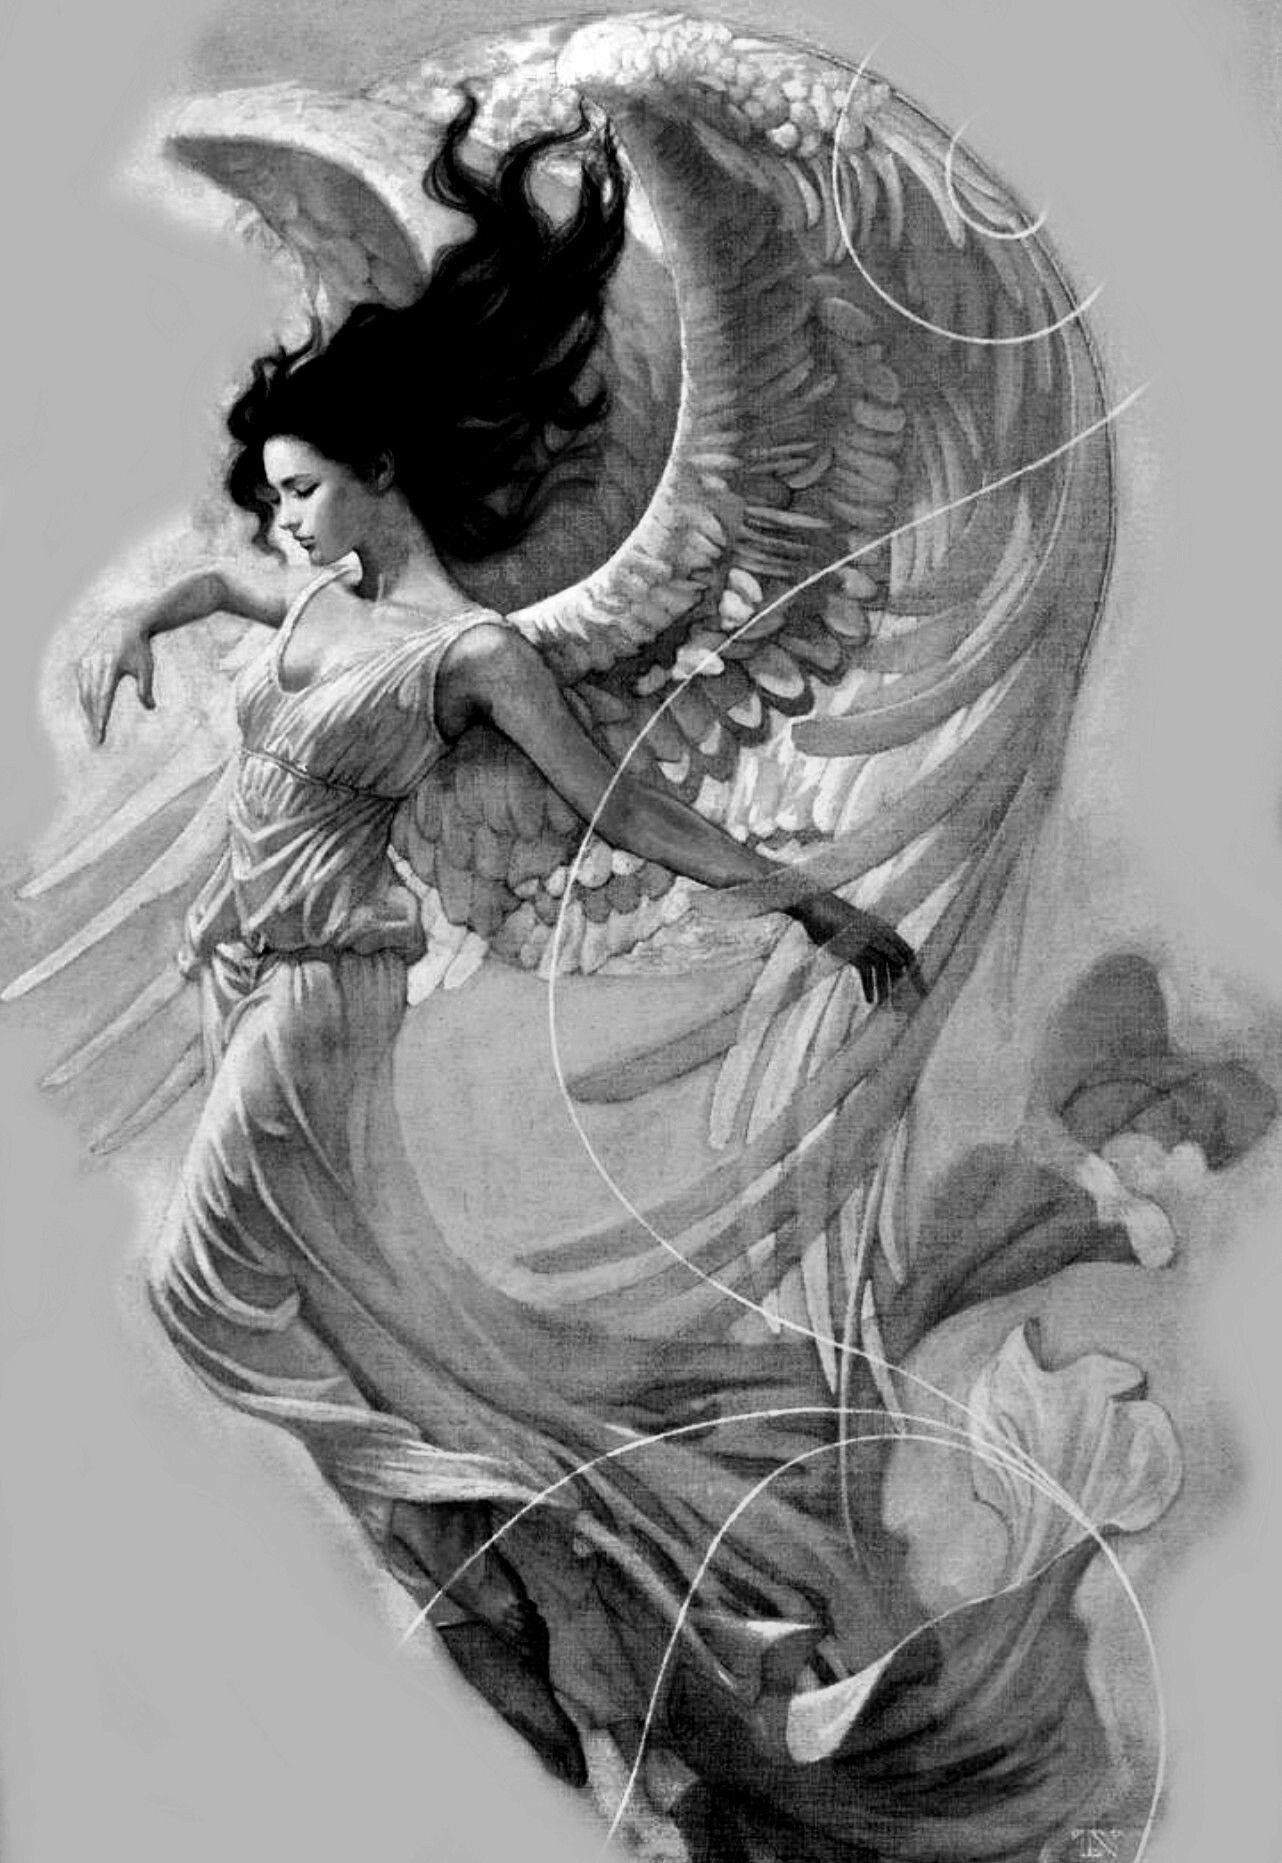 600+ Free Guardian Angel & Angel Images - Pixabay